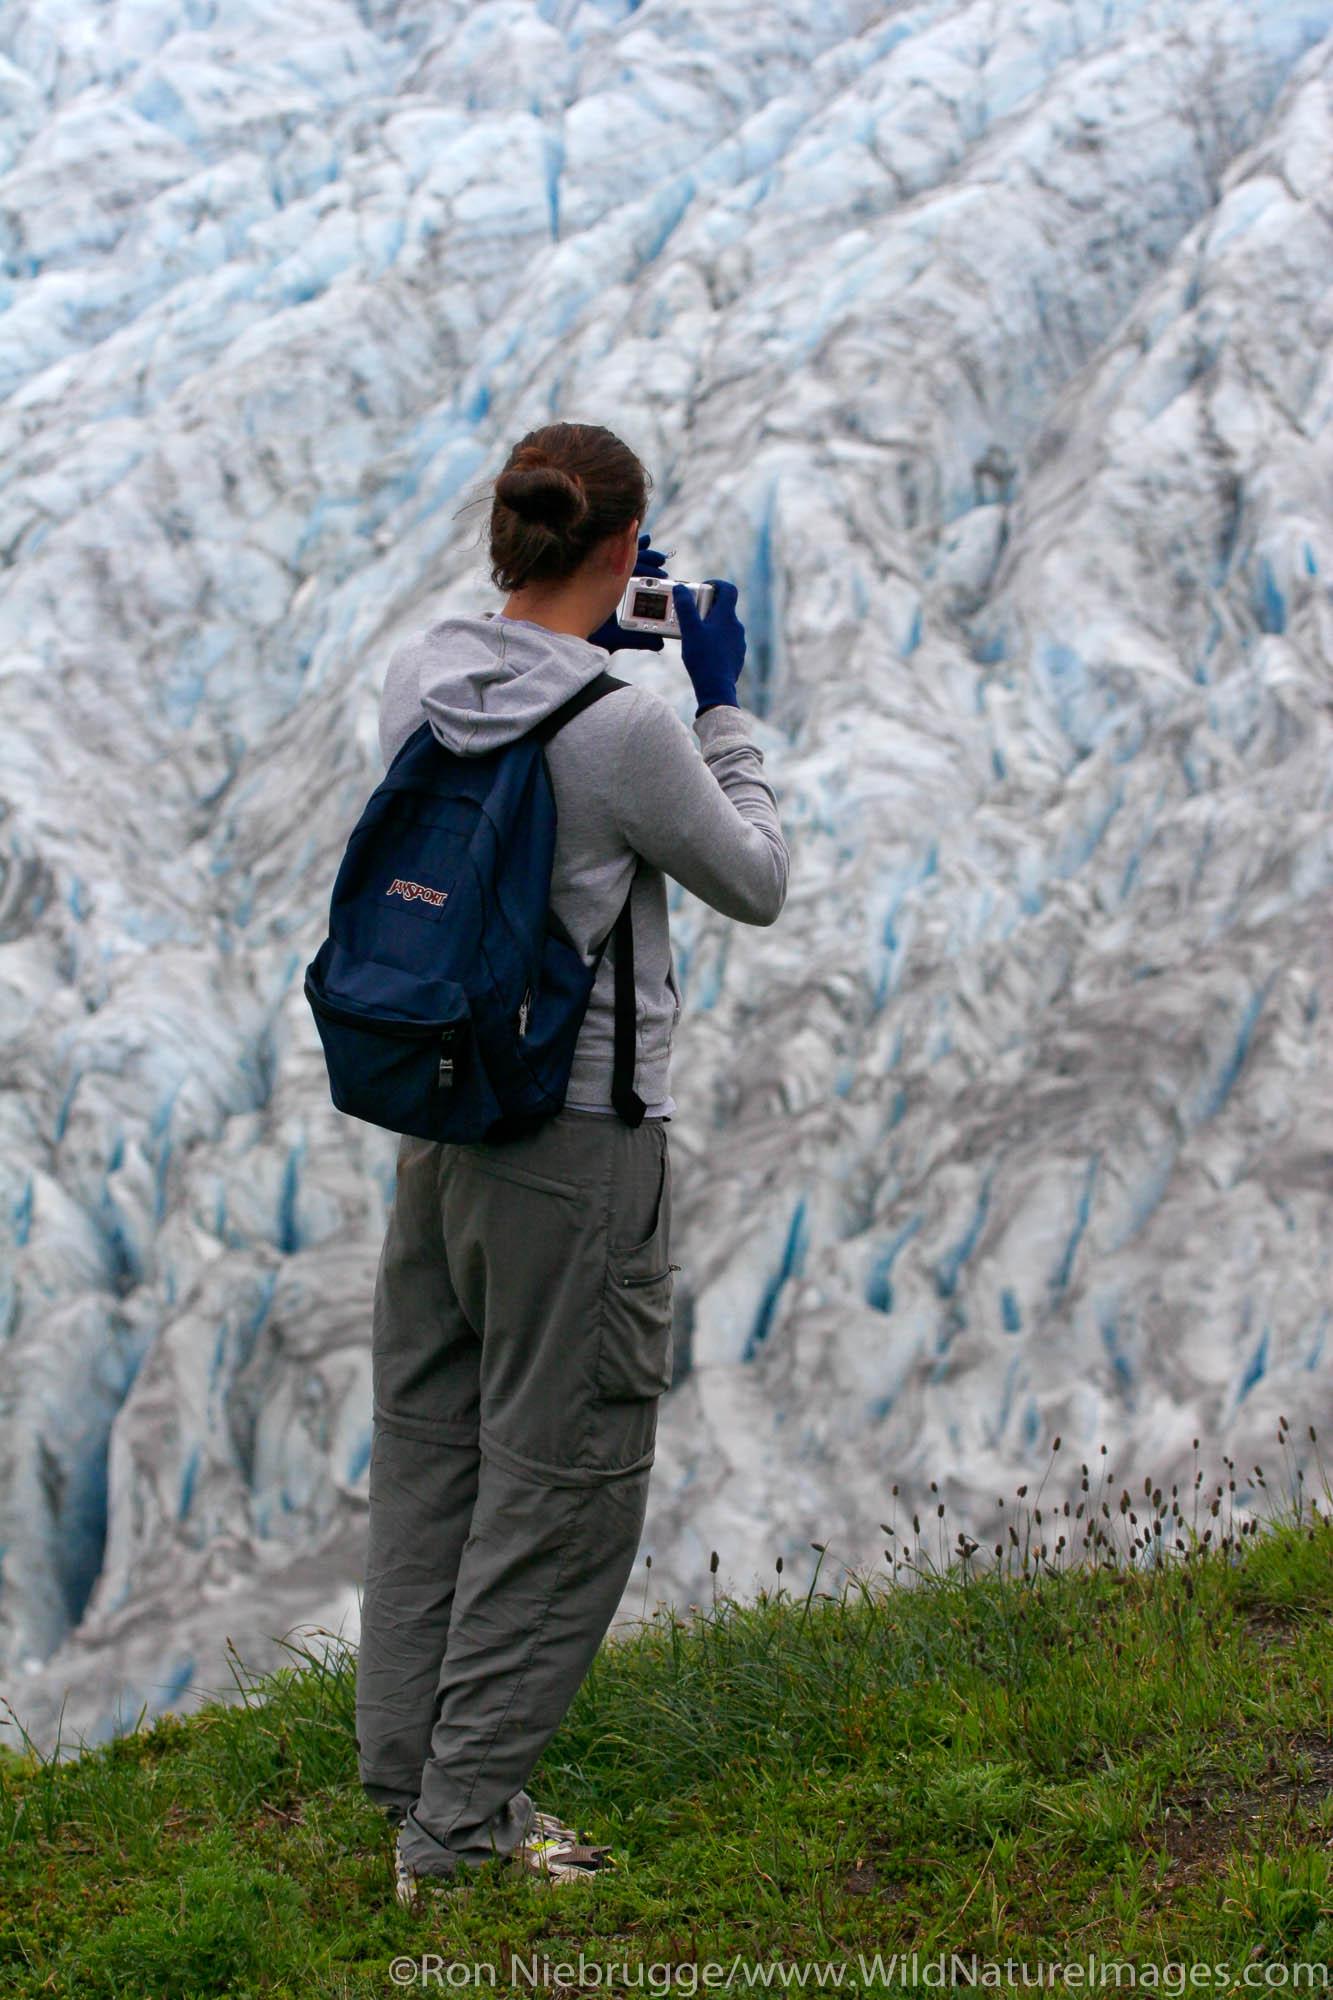 A hiker views Exit Glacier and the Harding Icefield from the Harding Icefield trail, Kenai Fjords National Park, Alaska.